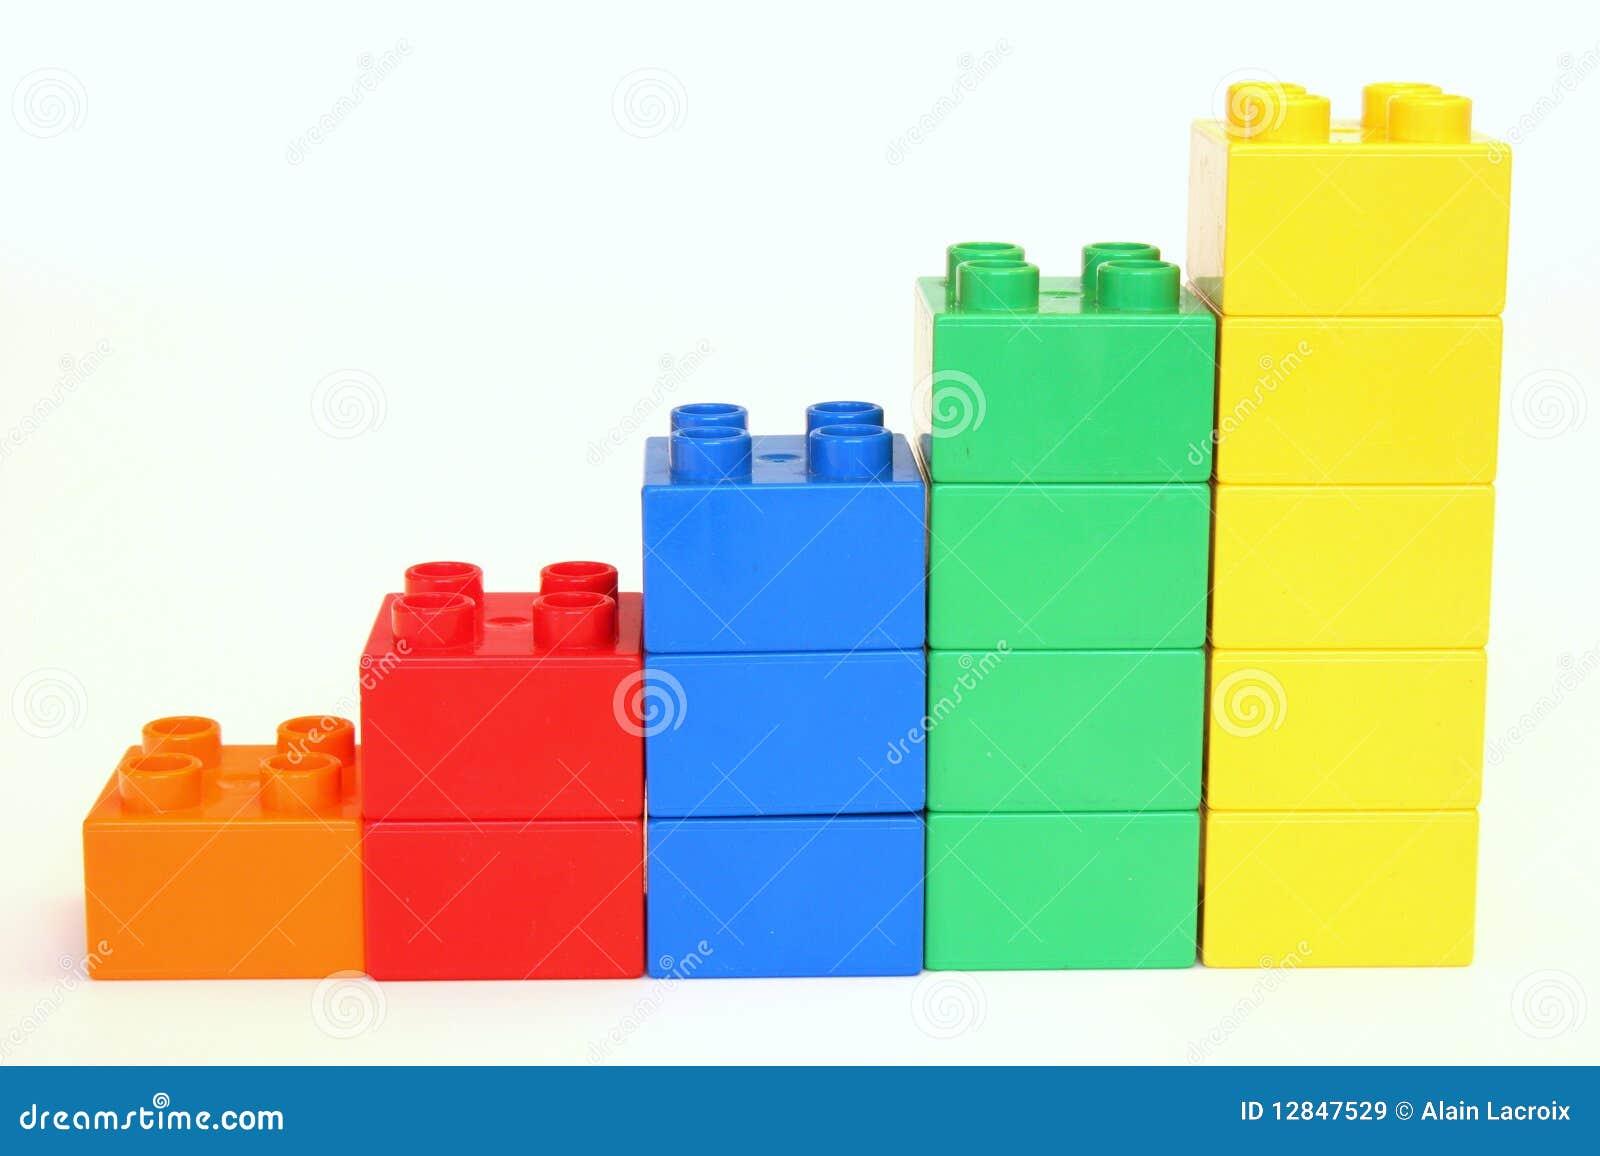 Rising building blocks